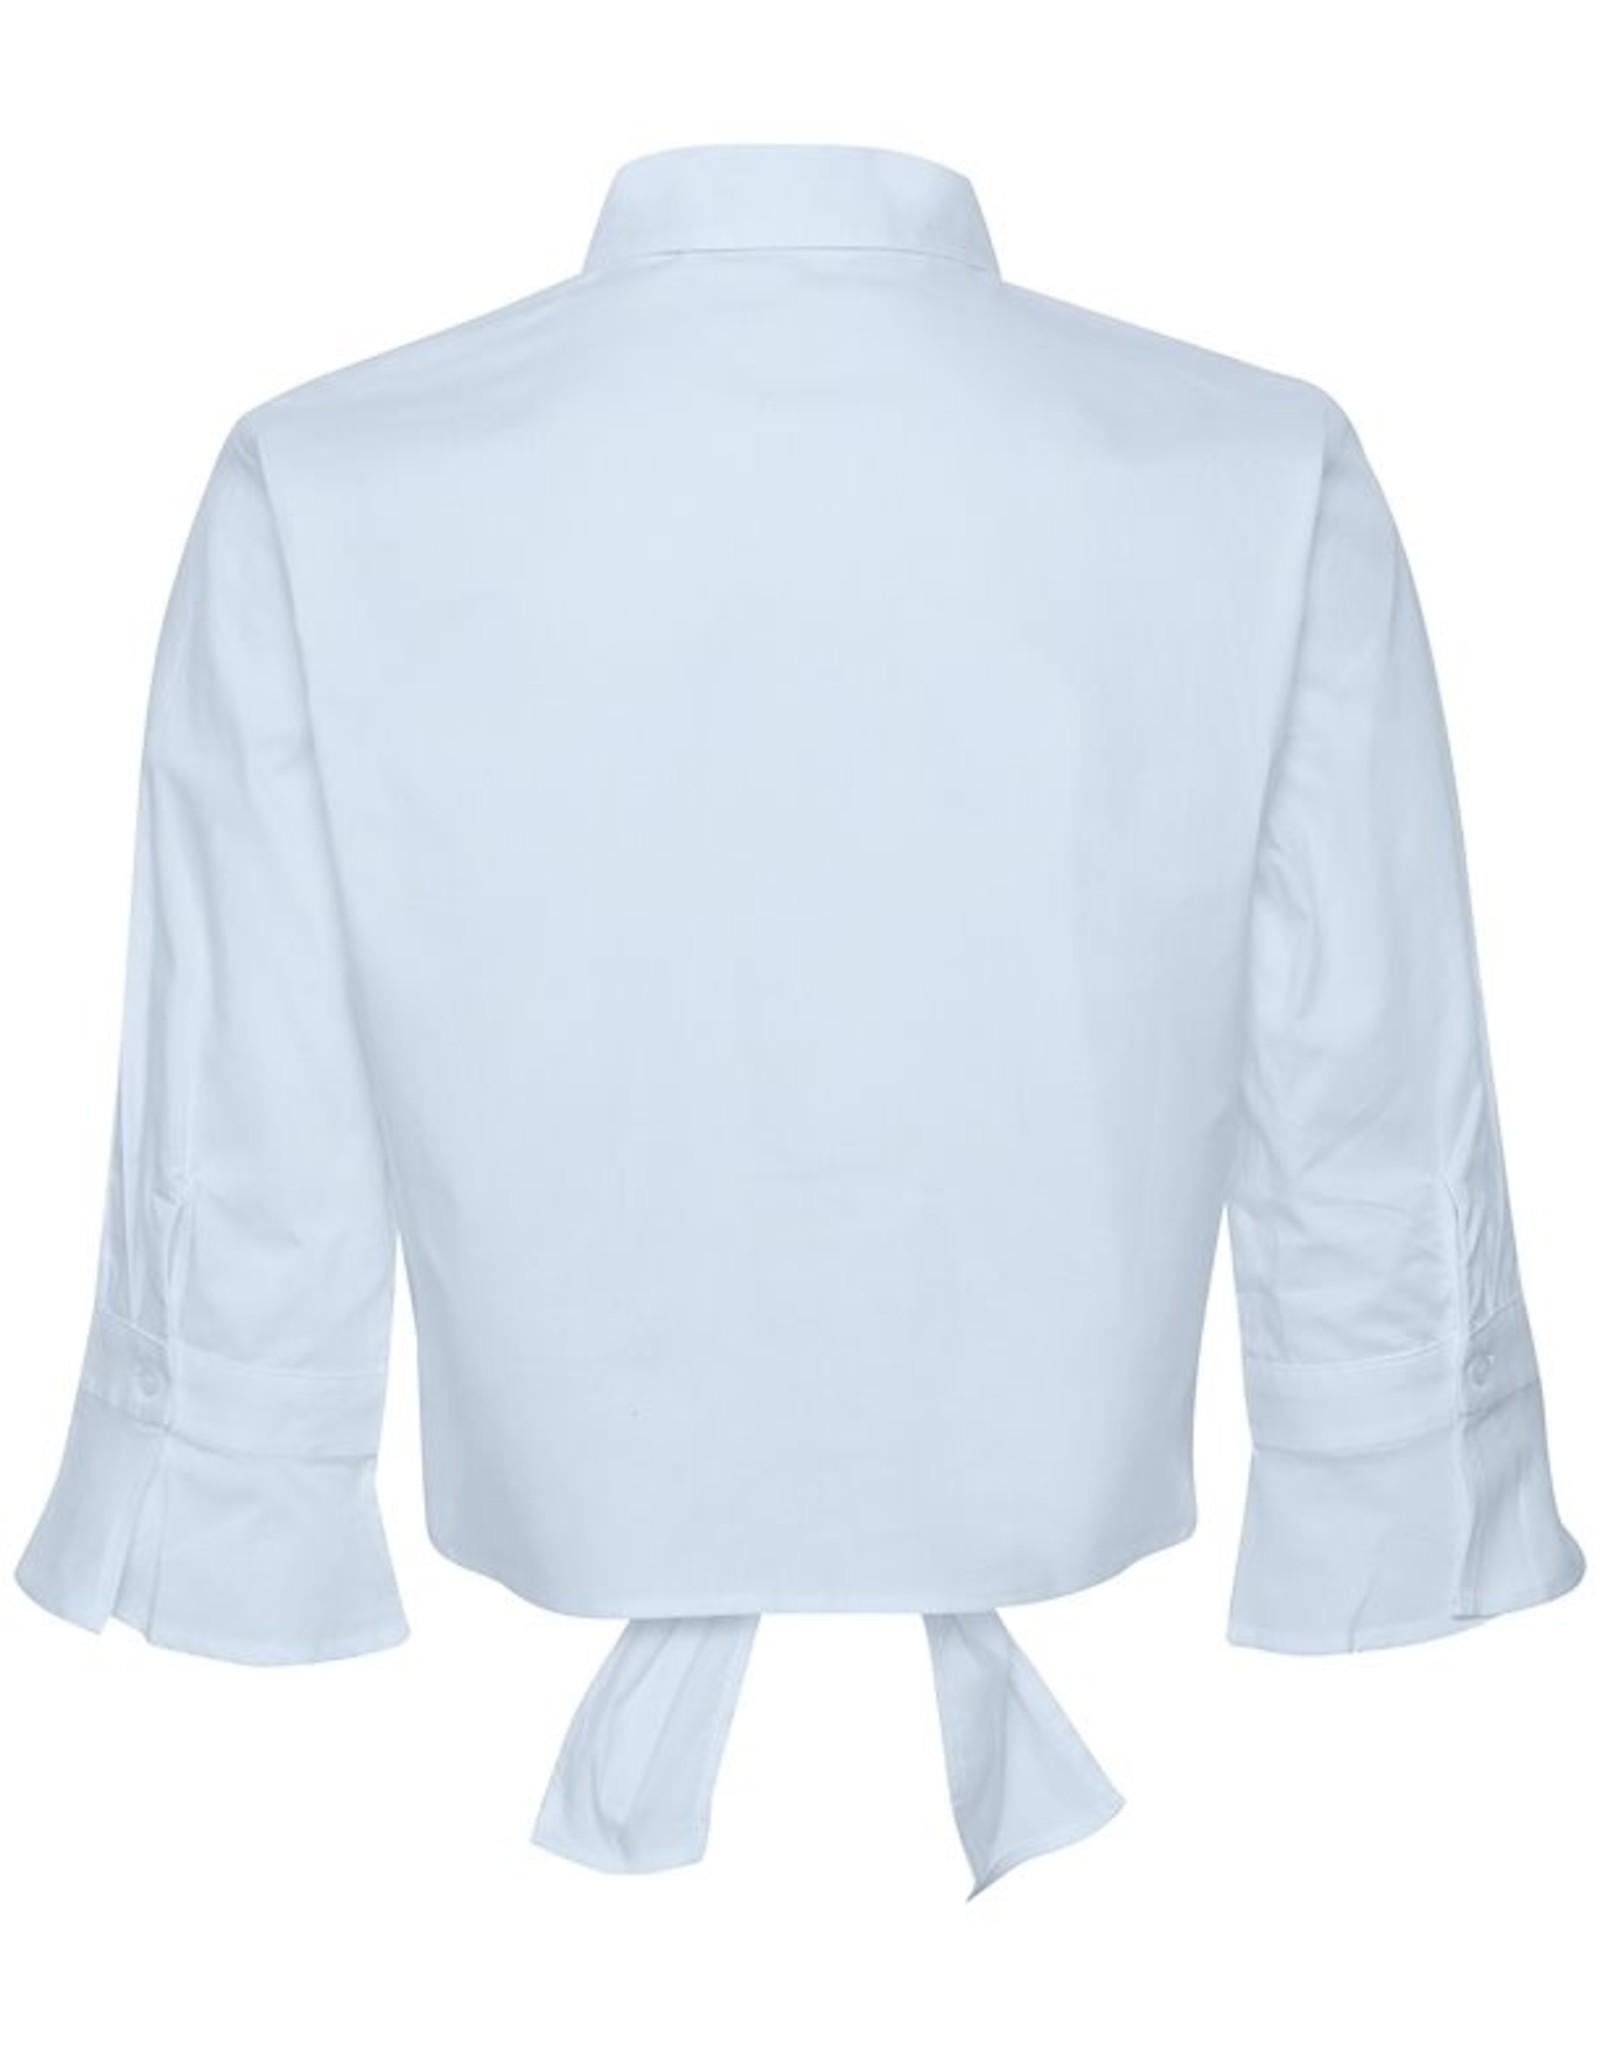 Gestuz Ibby Cropped Shirt Xenon Blue